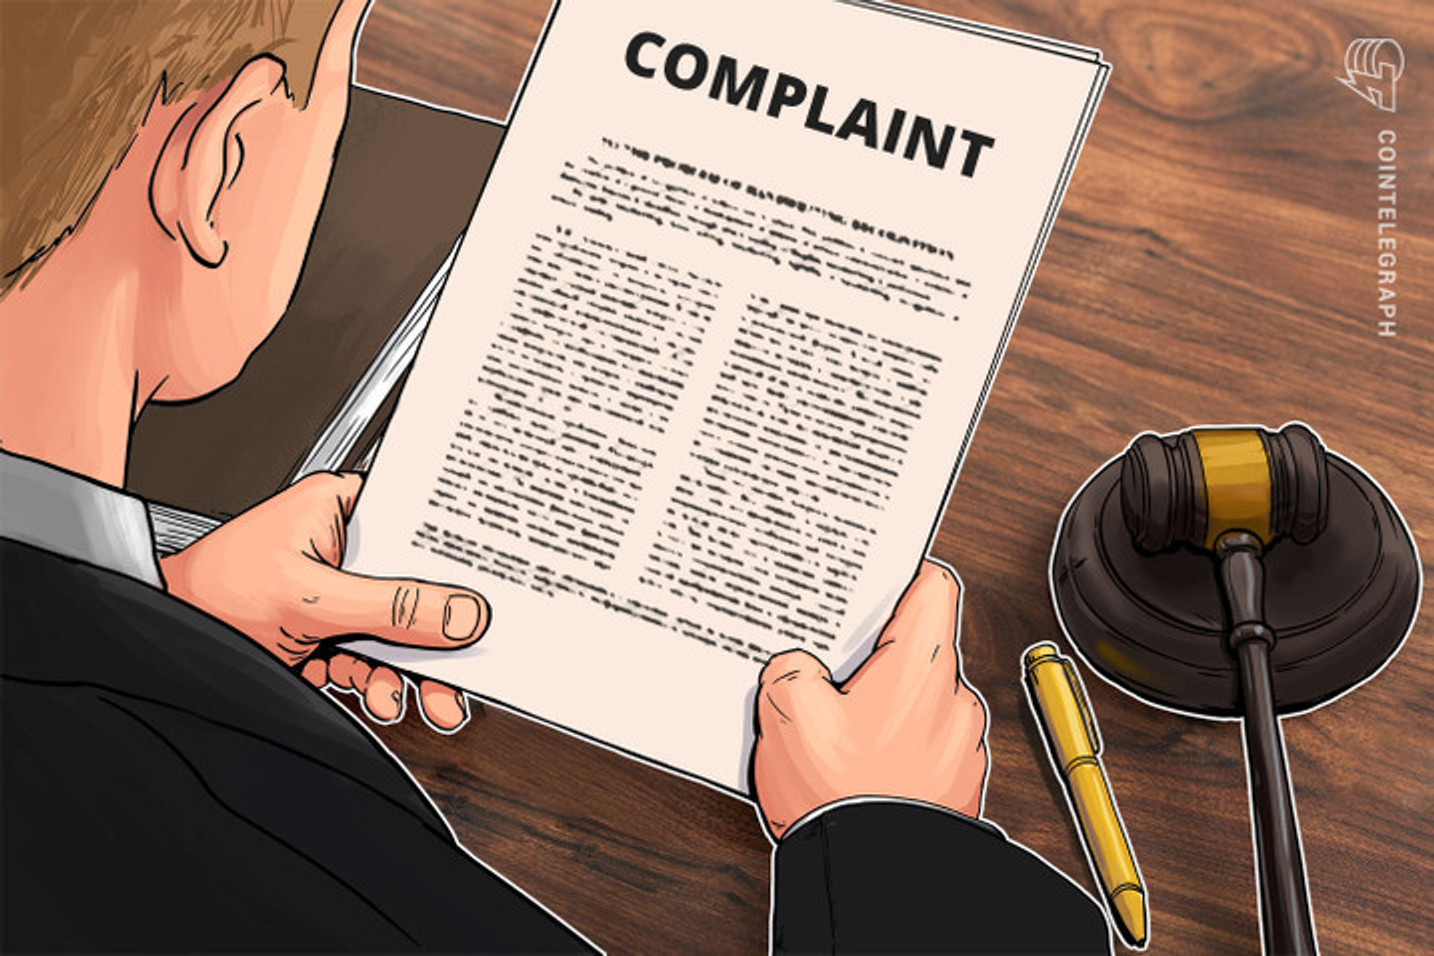 Ante denuncias a varias empresas, la Cámara Argentina de Fintech repudió prácticas fraudulentas